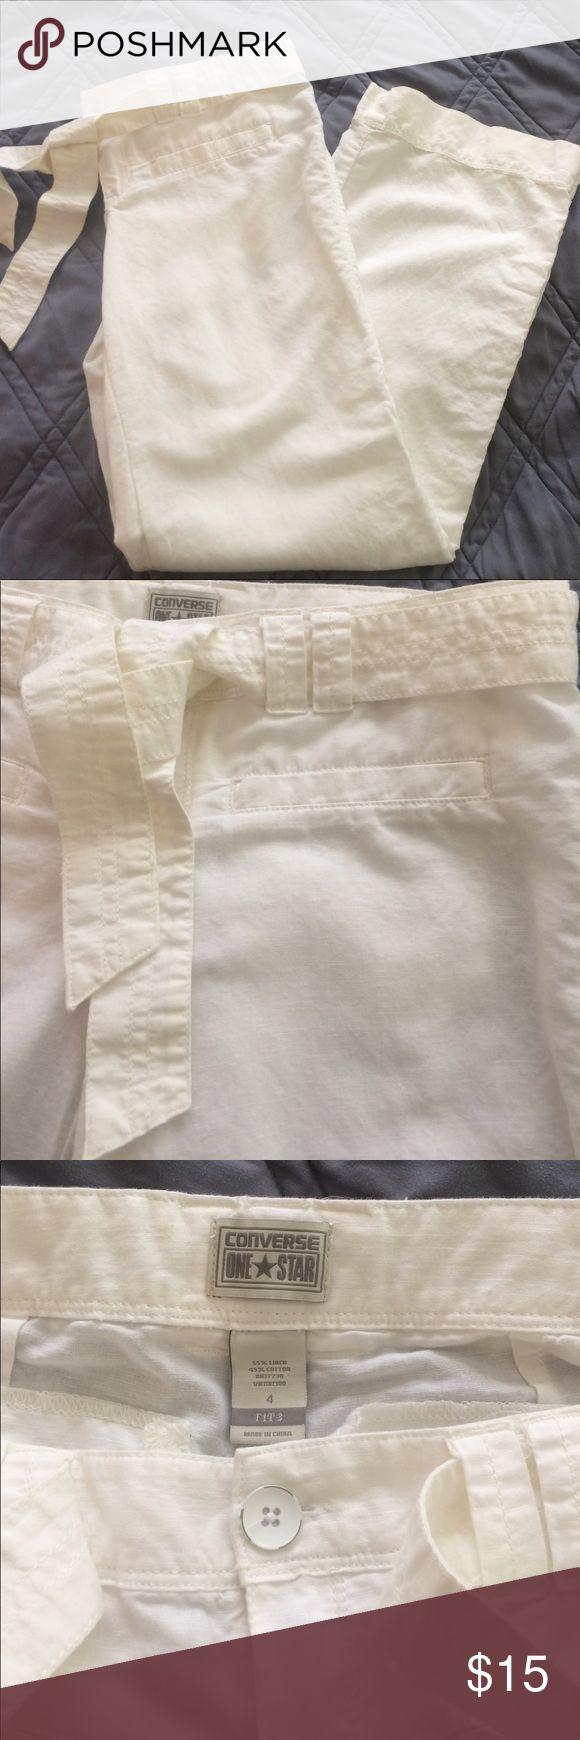 "White linen pants Converse One Star white linen pants with removable tie belt. 31"" inseam. Back pockets. 55% linen 45% cotton. Machine washable. Excellent condition. Converse Pants"